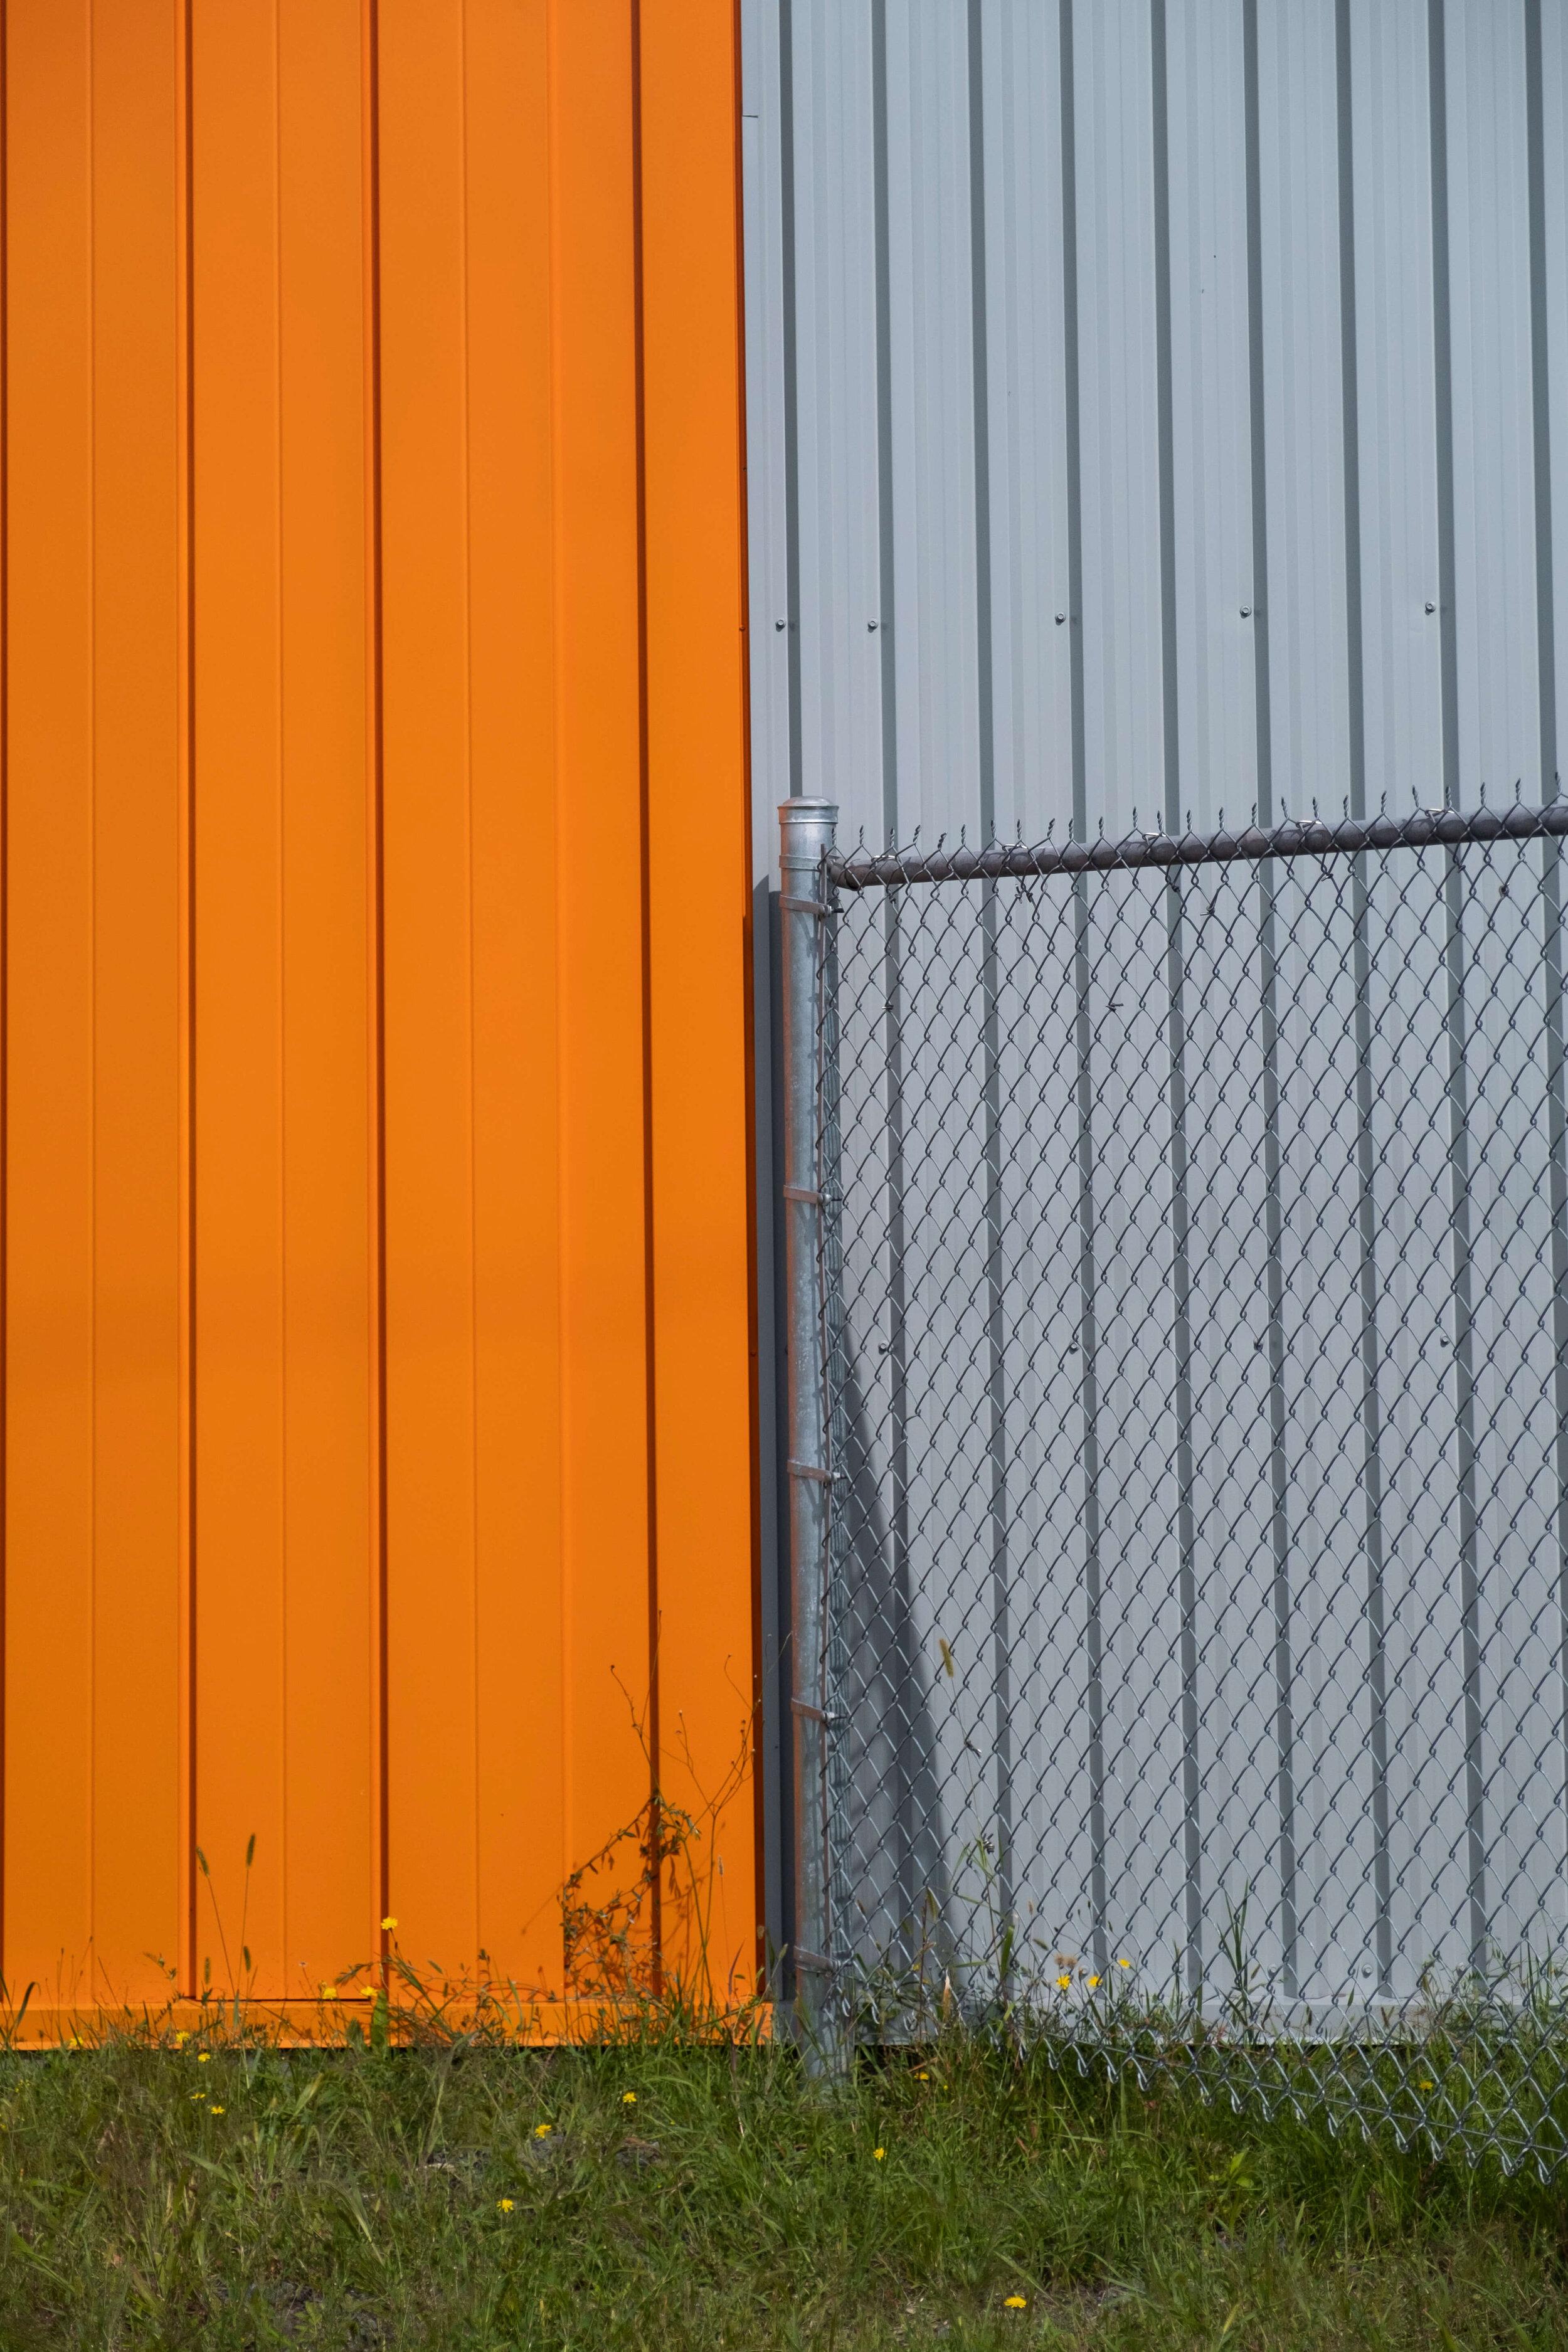 PR08 - Batisse orange_003.jpg